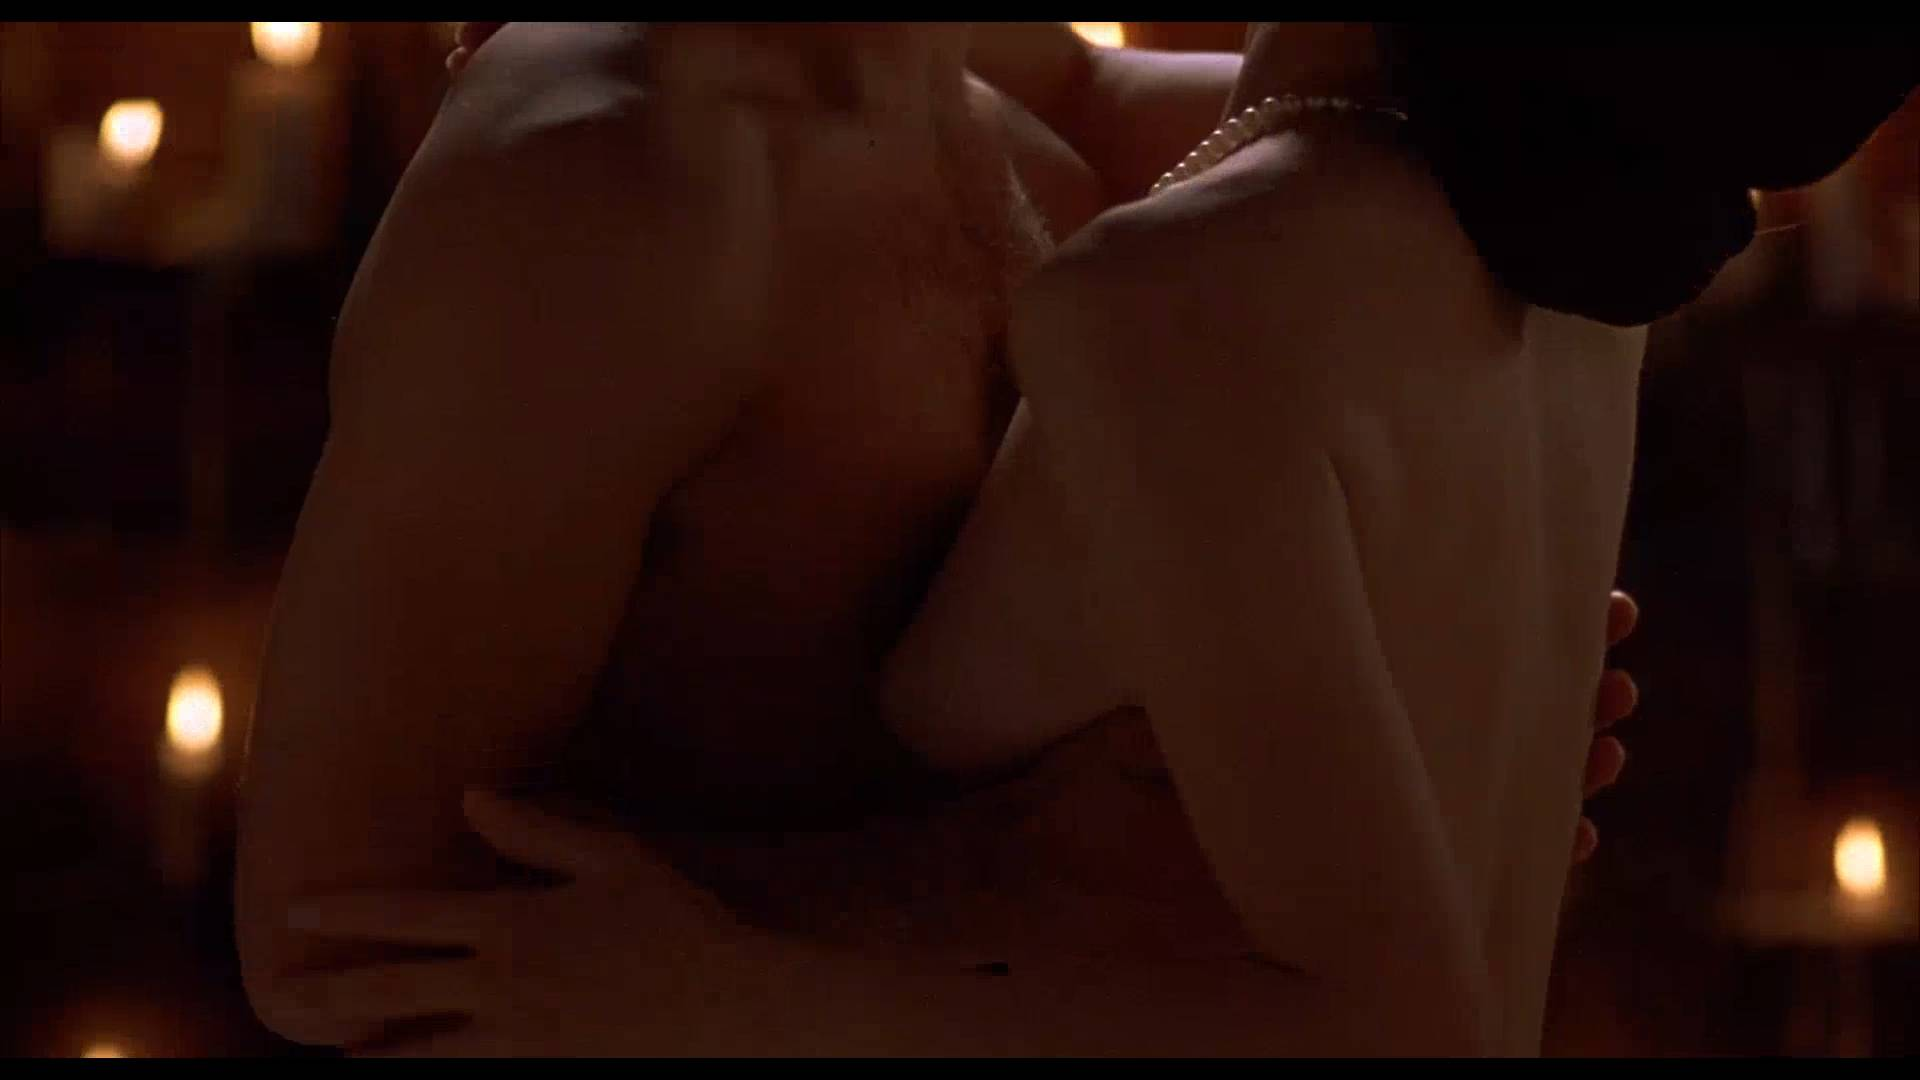 Lumi Cavazos nude full frontal Claudette Maille nude bush and Regina Torné nude topless - Como agua para chocolate (1992) 1080p (4)